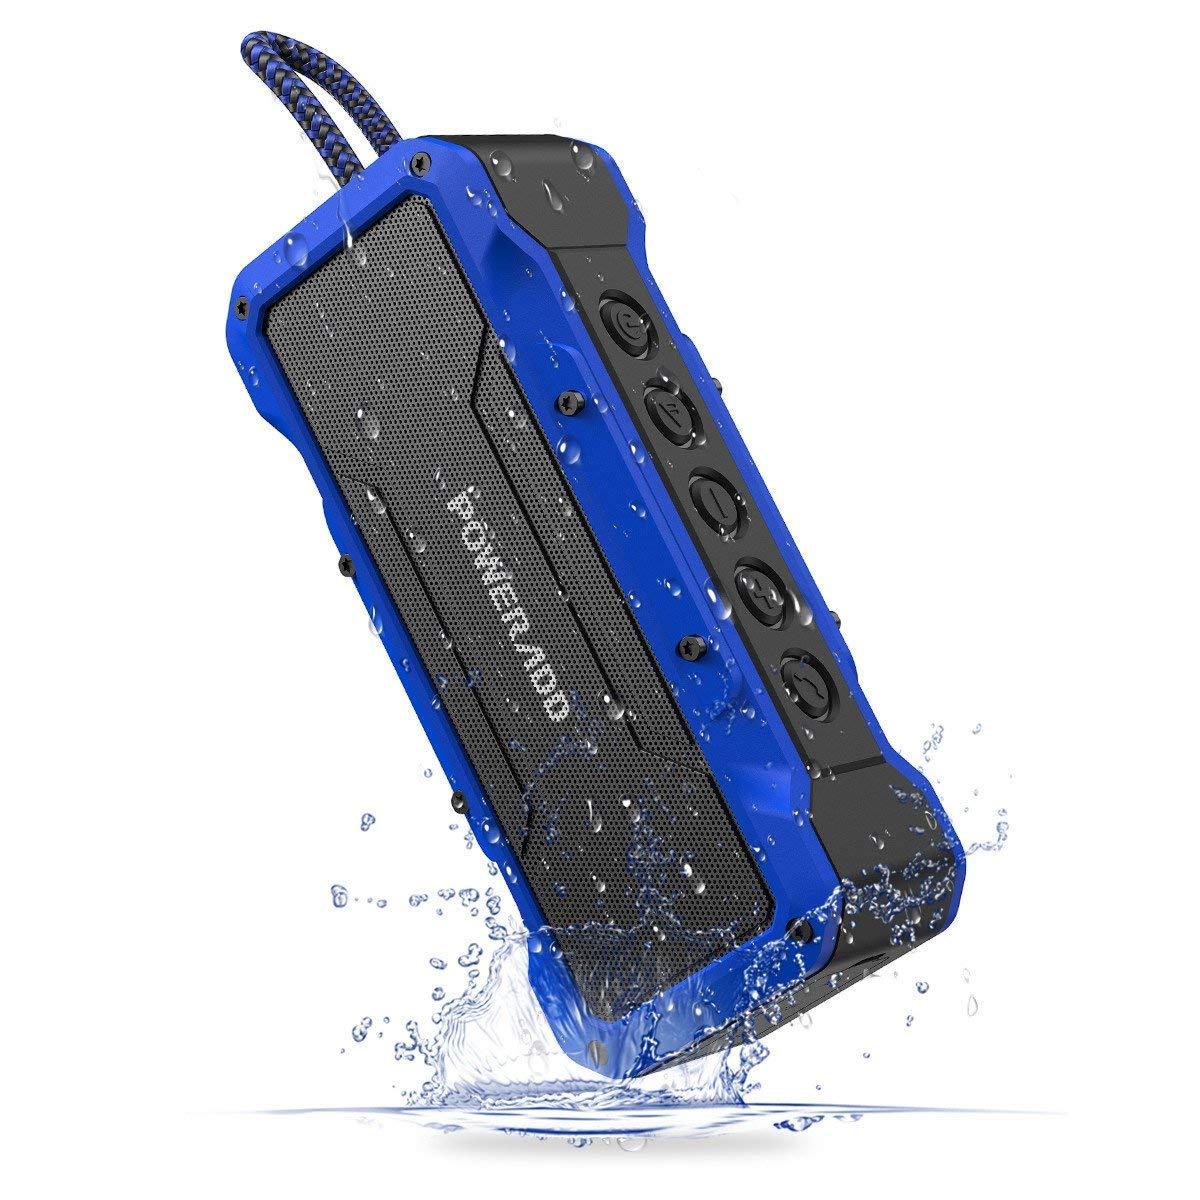 Poweradd MusicFly II + Indoor/Outdoor Portable Bluetooth/Wireless Speakers with 36Watt Loud Volume,Super Big Sound, IPX7 Waterproof, for Pool Beach Party, Blue